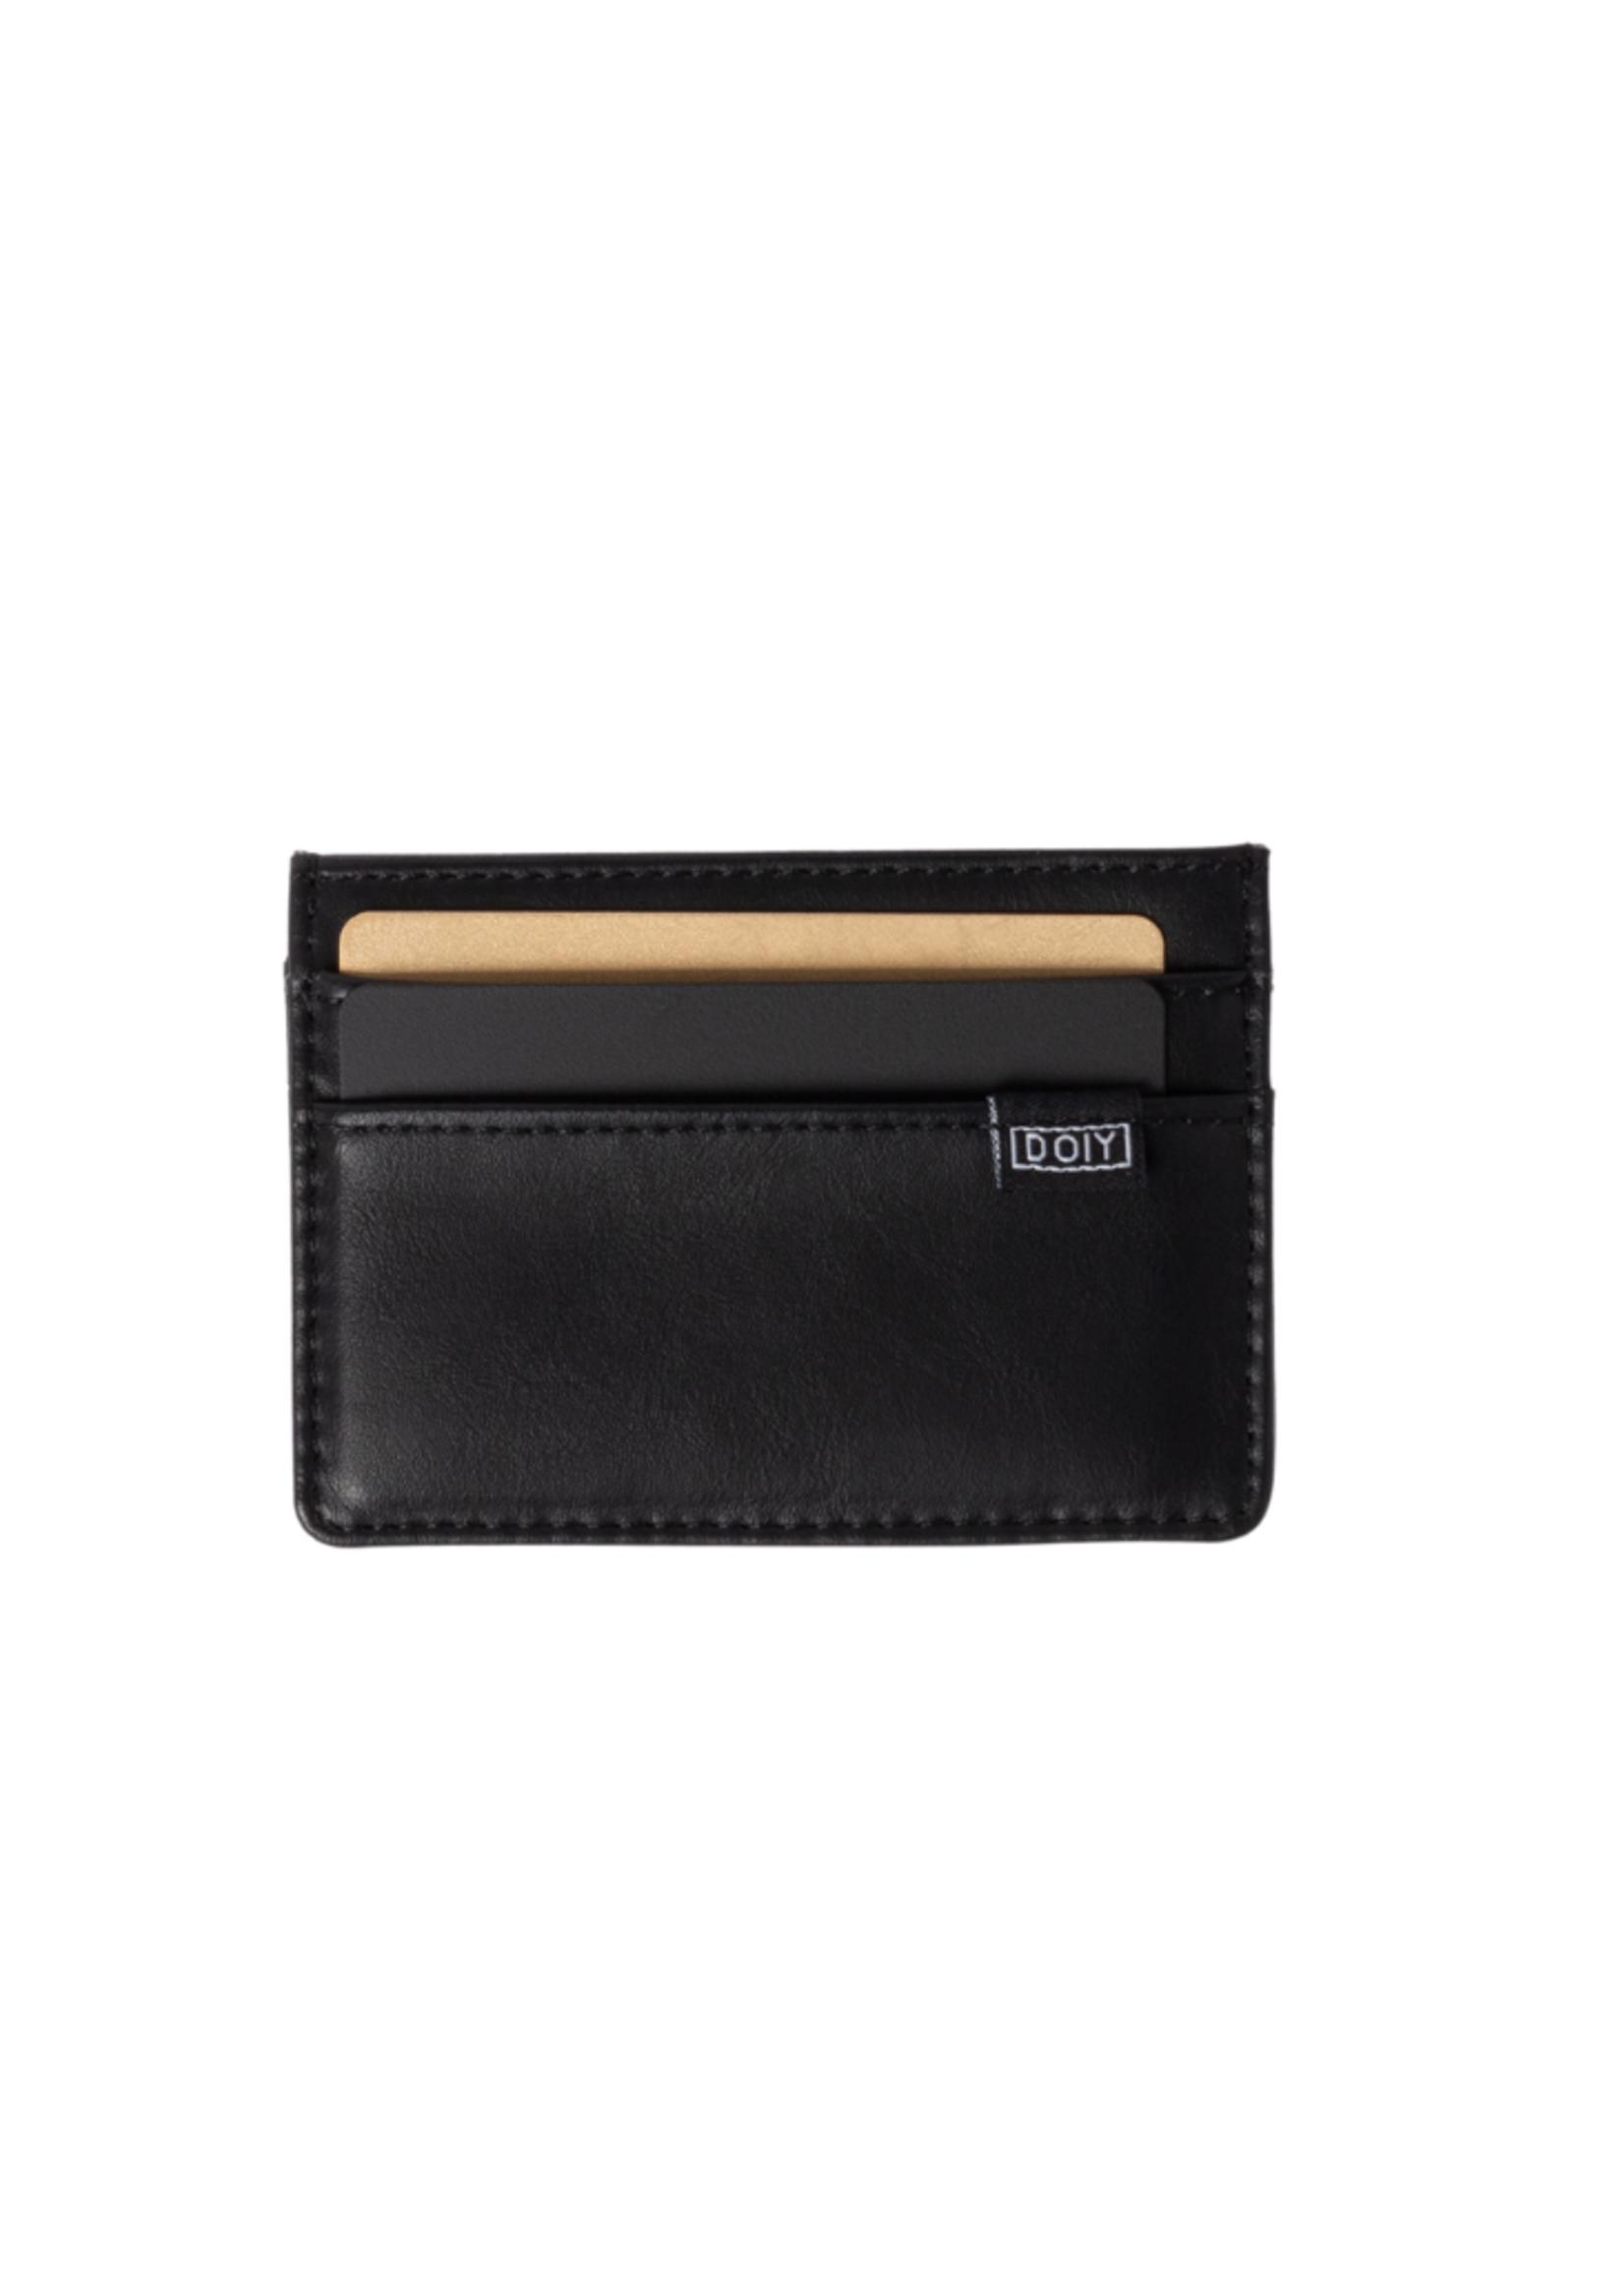 DOIY DOIY Honom Card Wallet Black